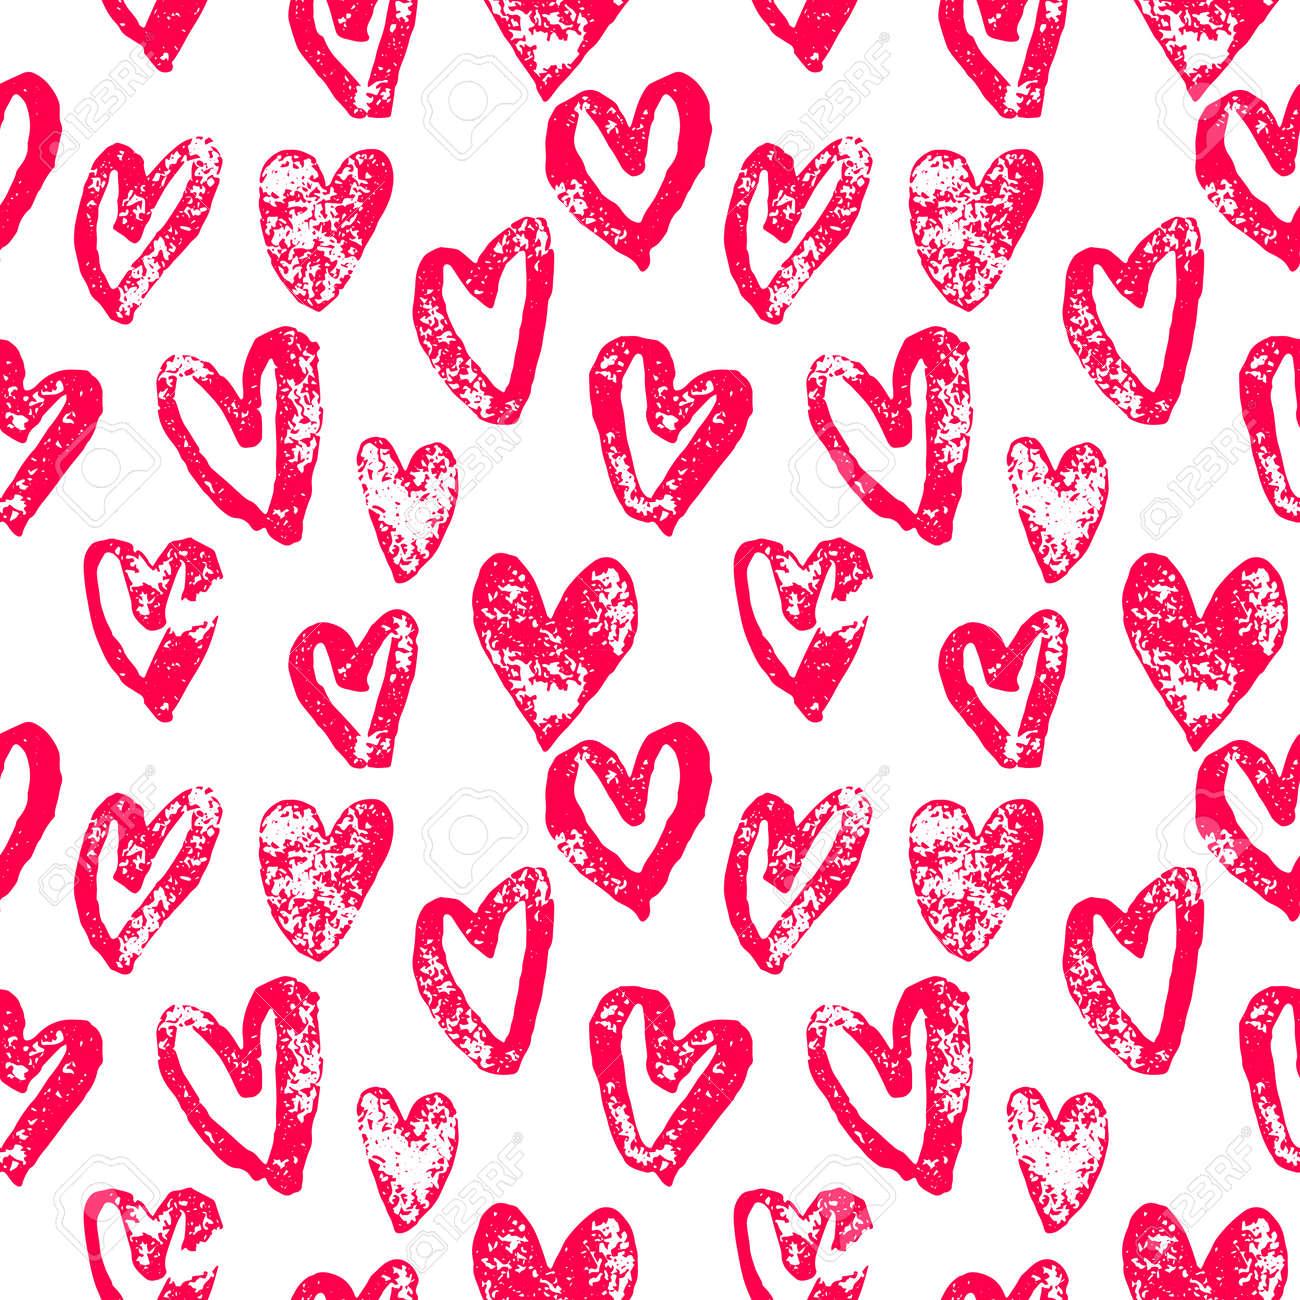 Valentine Day Hearts Pattern Background Of Hand Drawn Heart